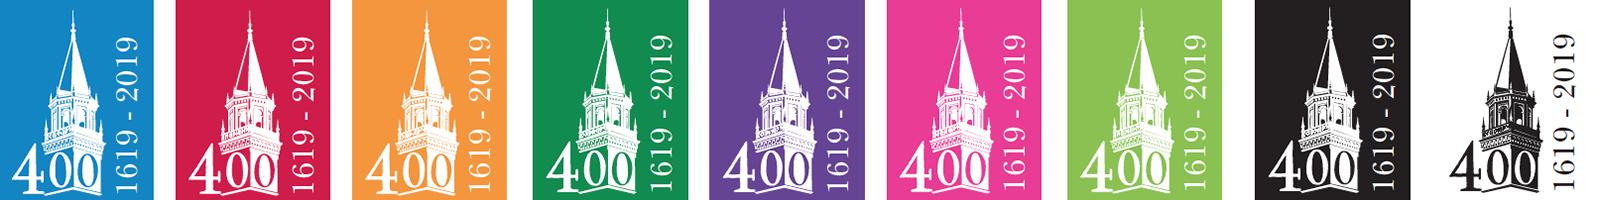 400 Years logo